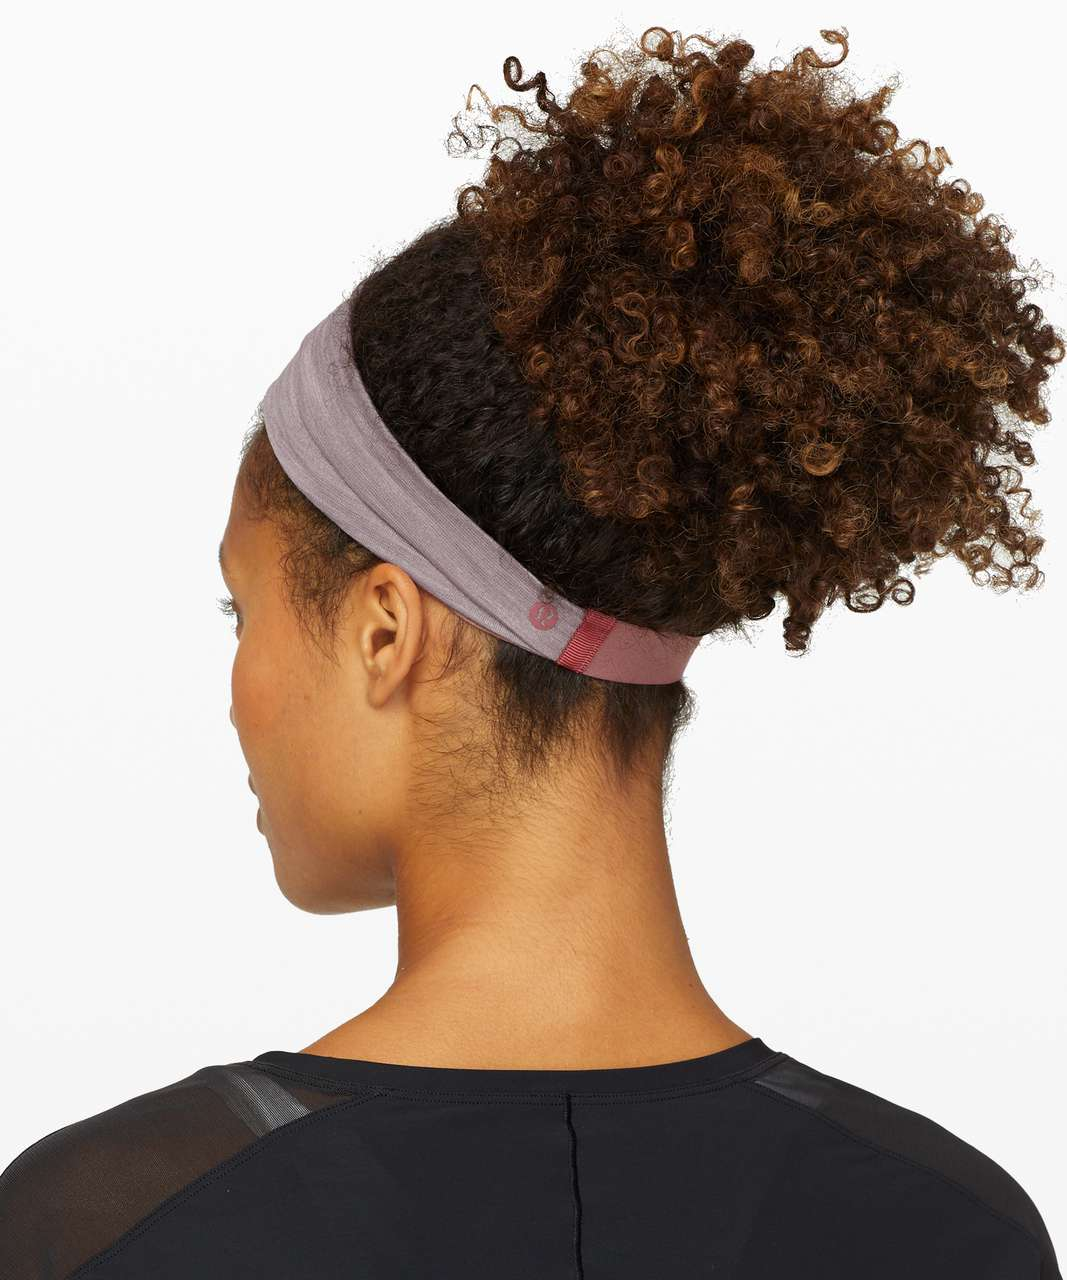 Lululemon Fringe Fighter Headband - Diamond Dye Pink Bliss Spanish Oak / Heathered Smoky Blush